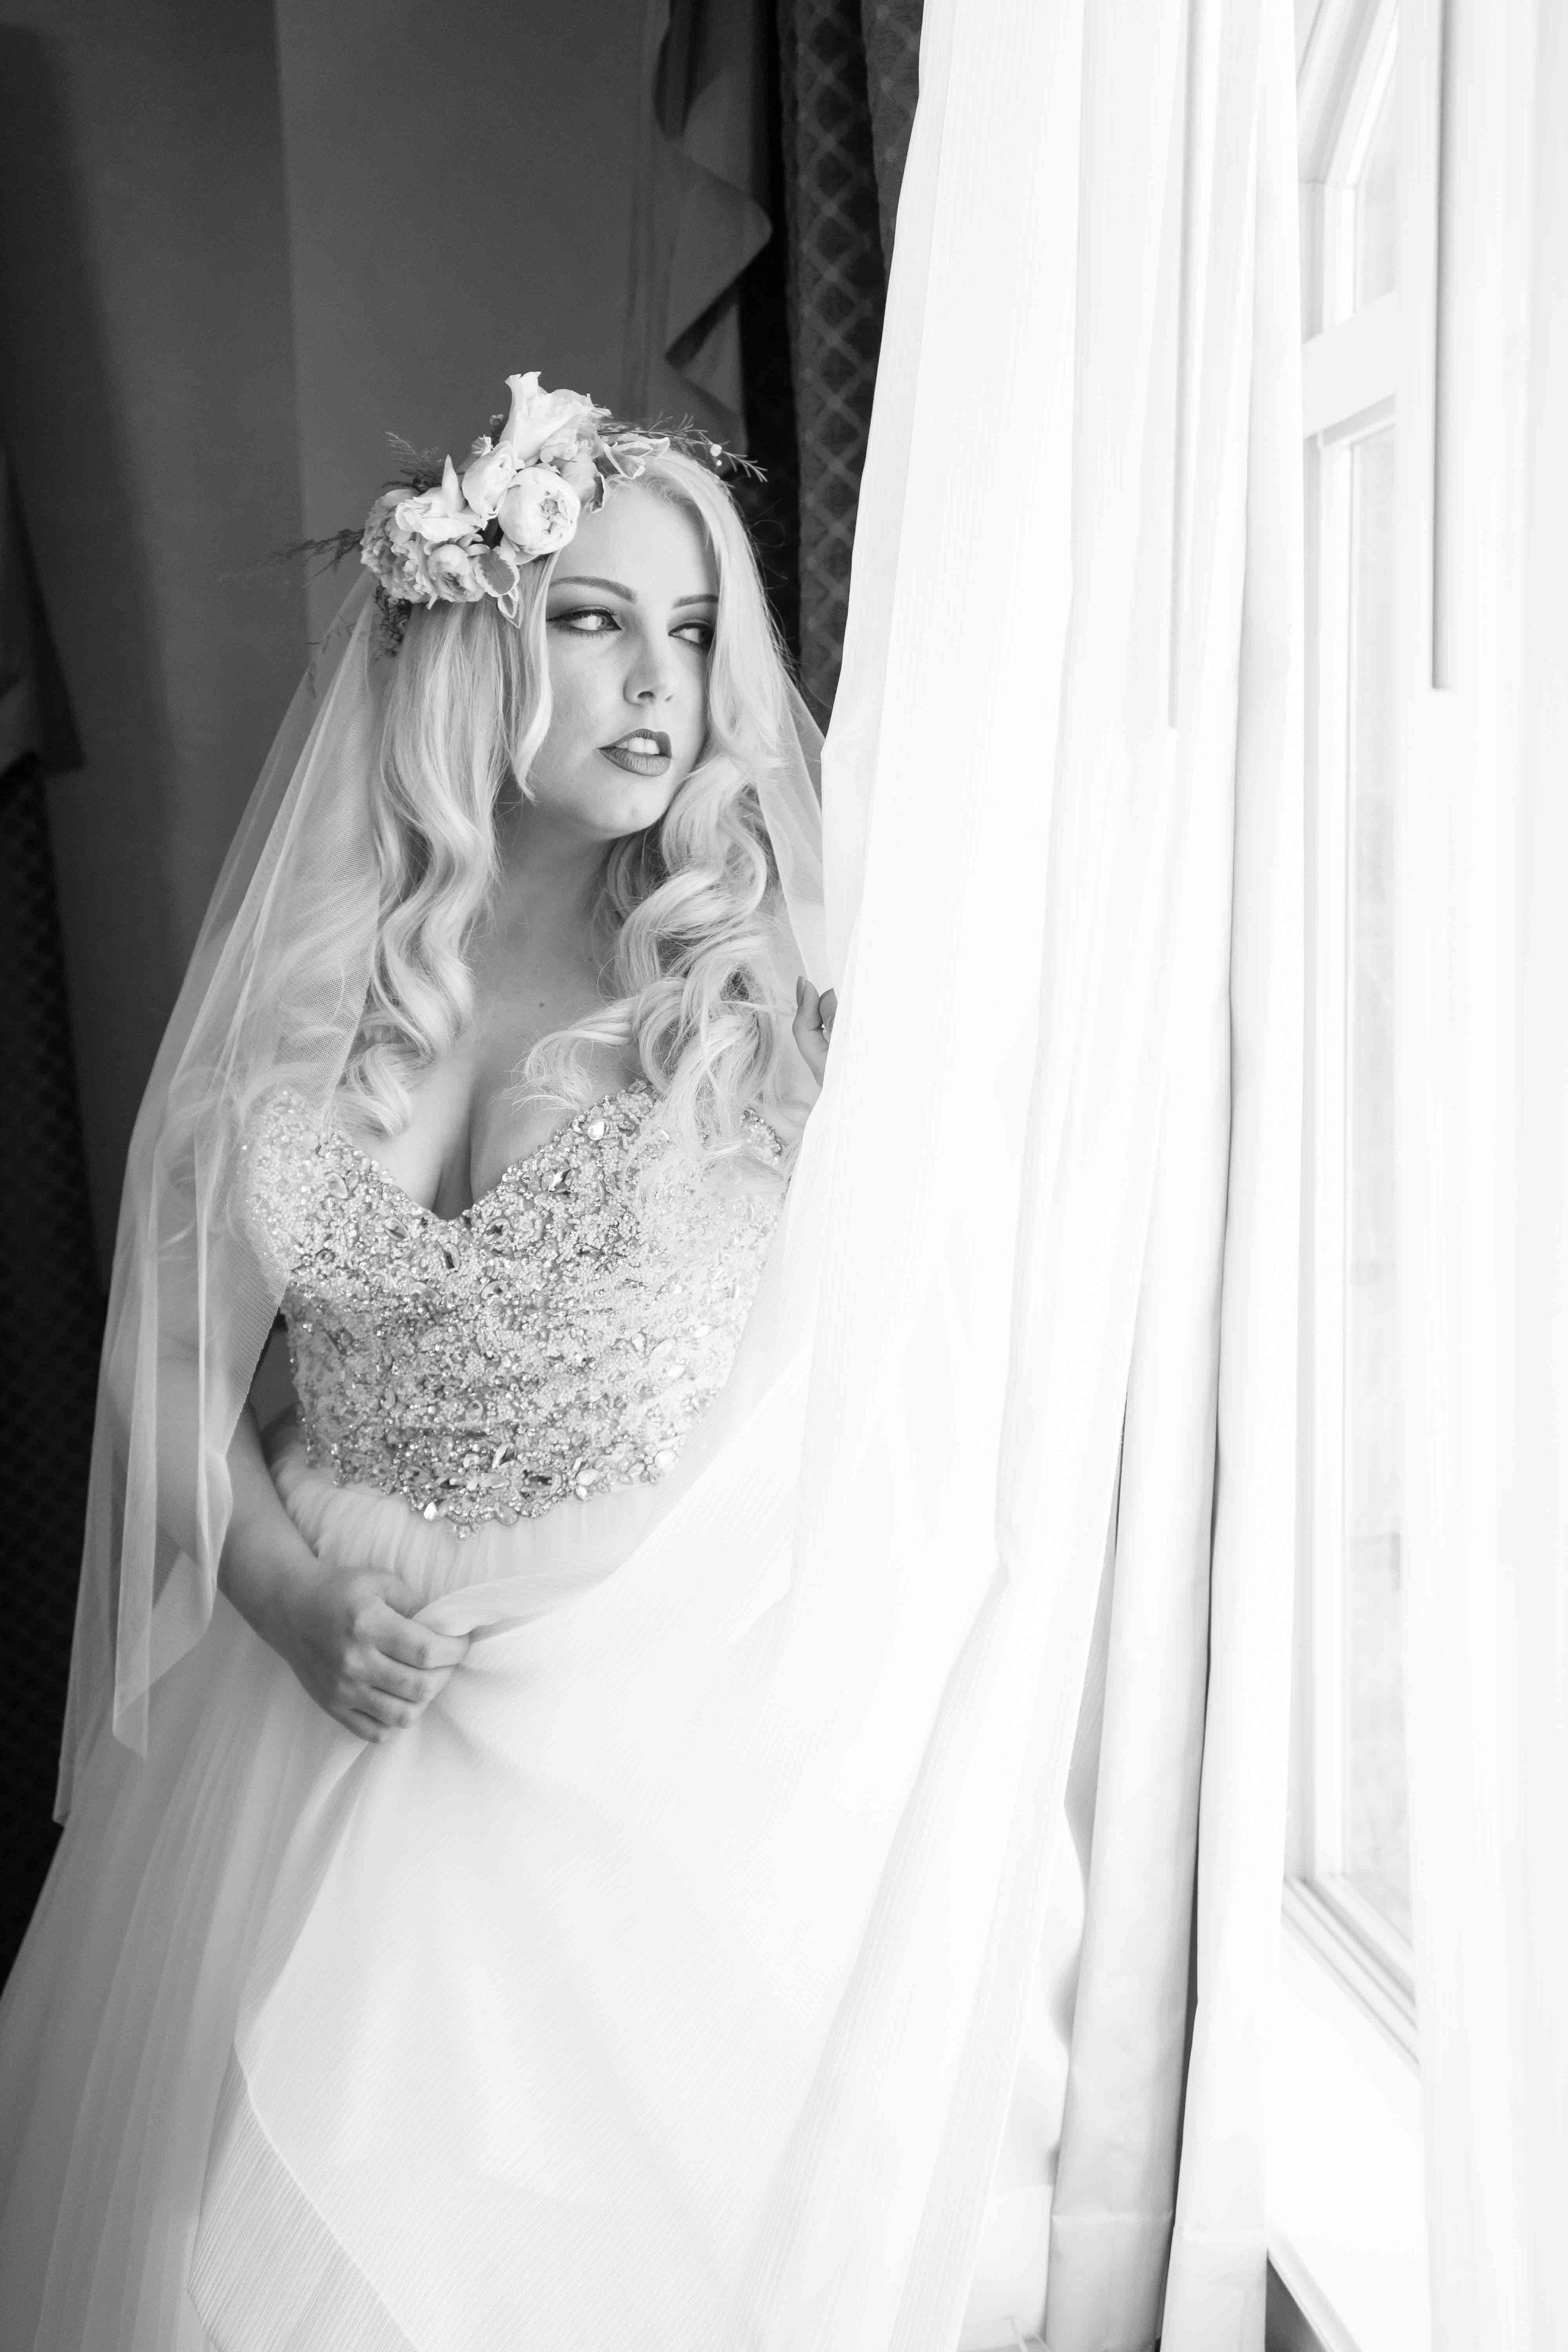 Kiara_and_Corbin_WEDDING_ Brienne_Michelle_Photography_009.JPG